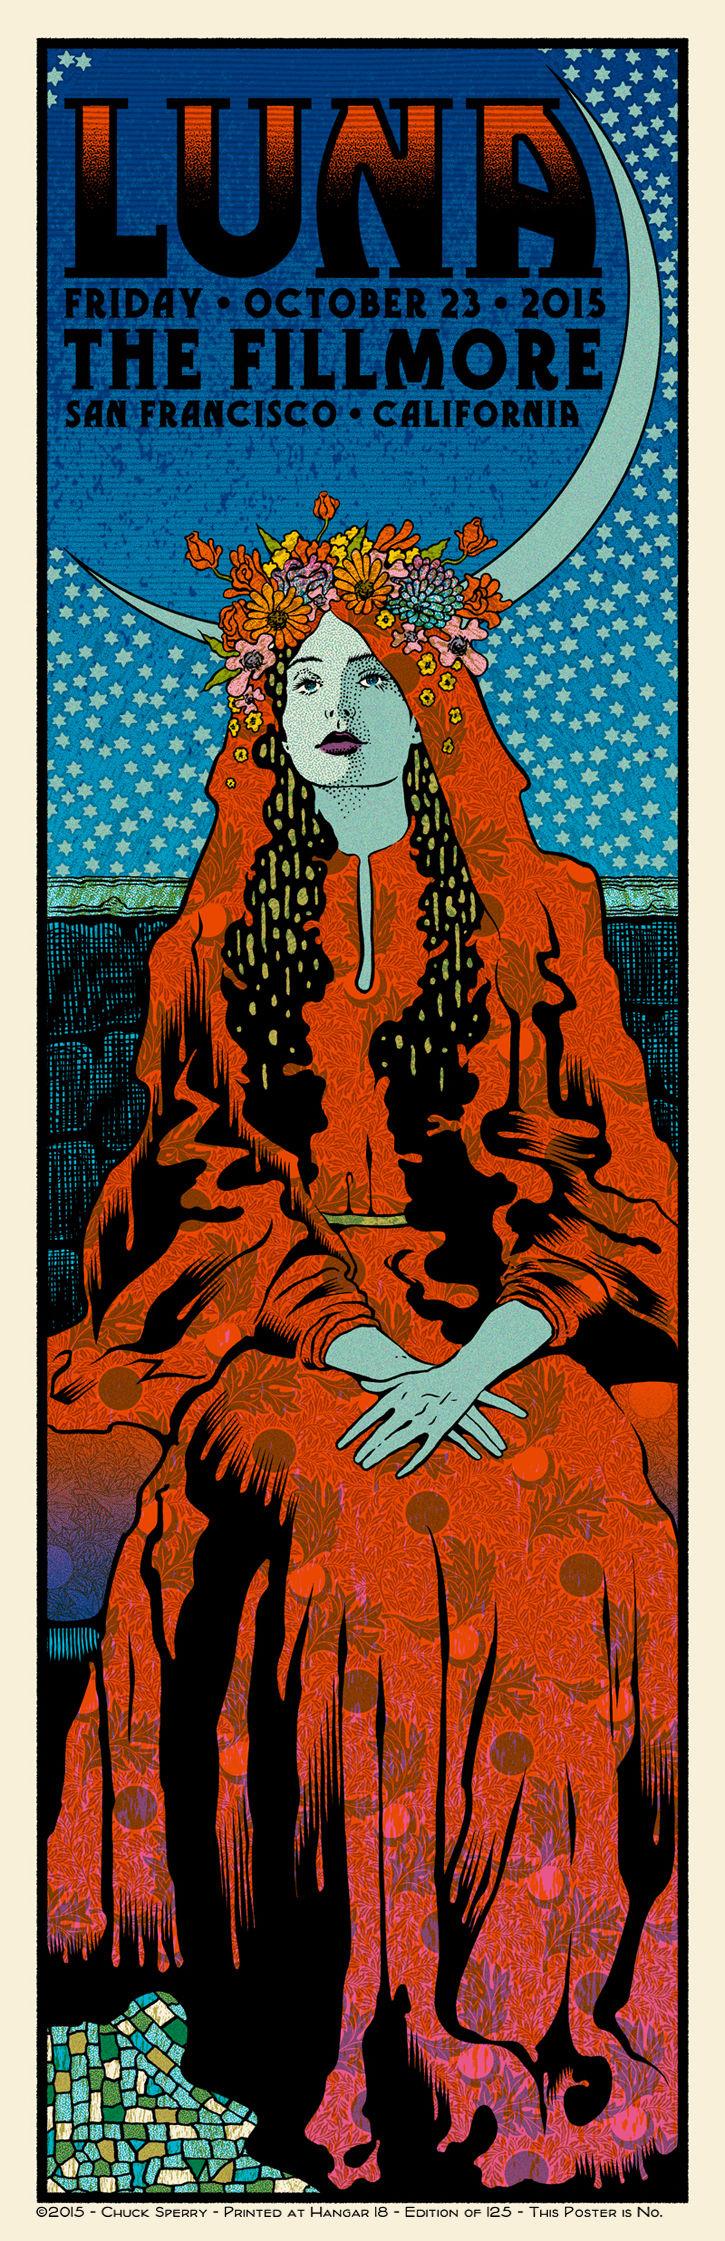 Poster for 23 October 2015 at The Fillmore, San Francisco, CA, USA